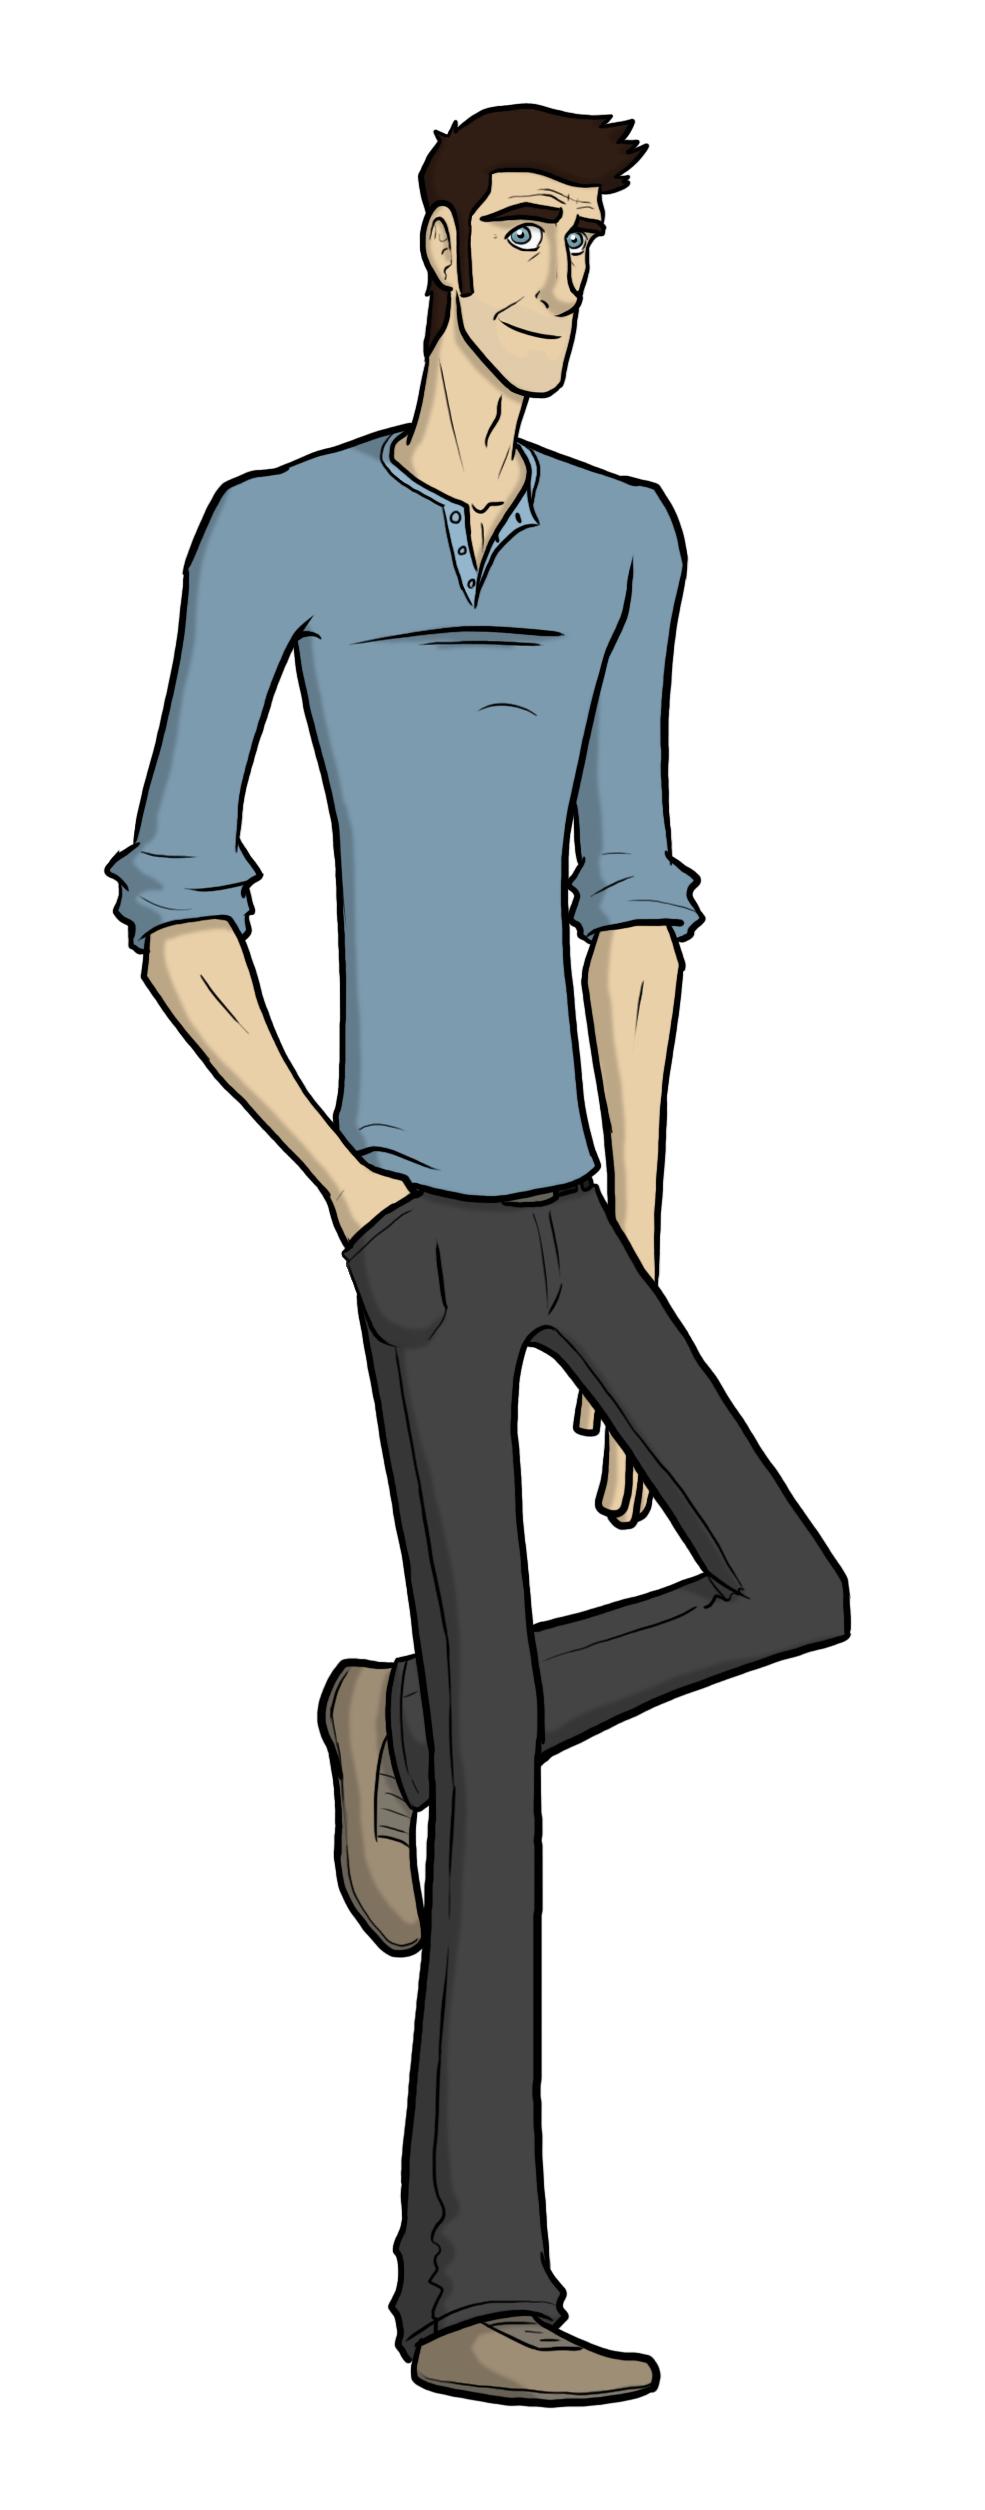 'Sidekick' - David Character Art by captainslam